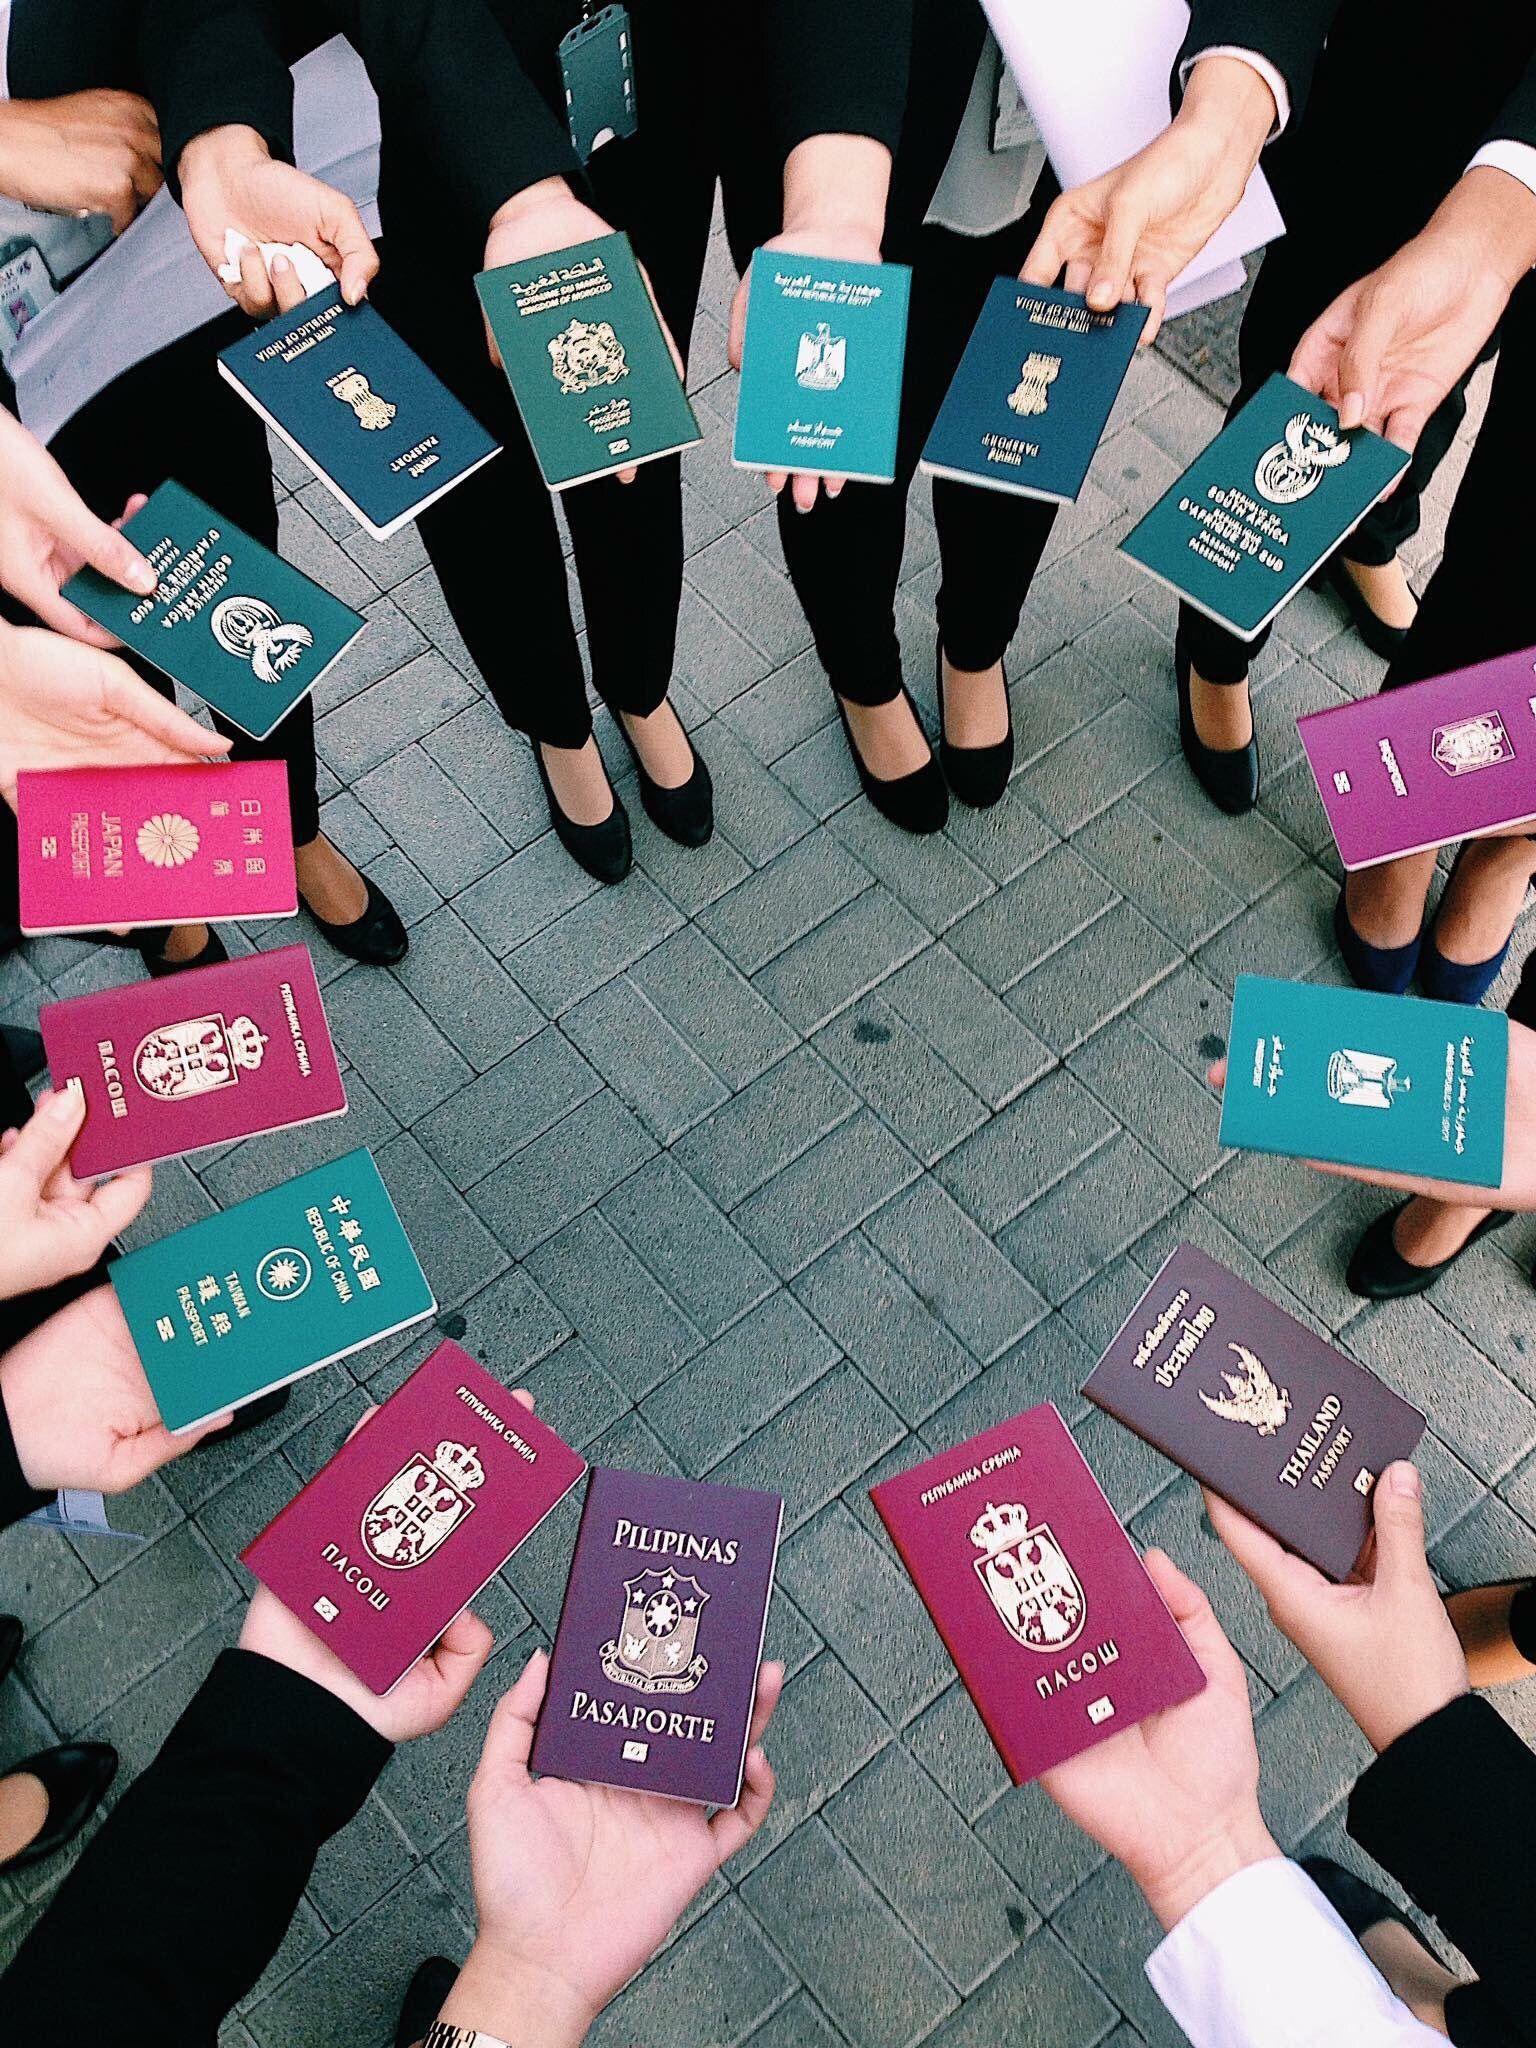 Hid360 Flight Attendant Airplane Photography Passport Online